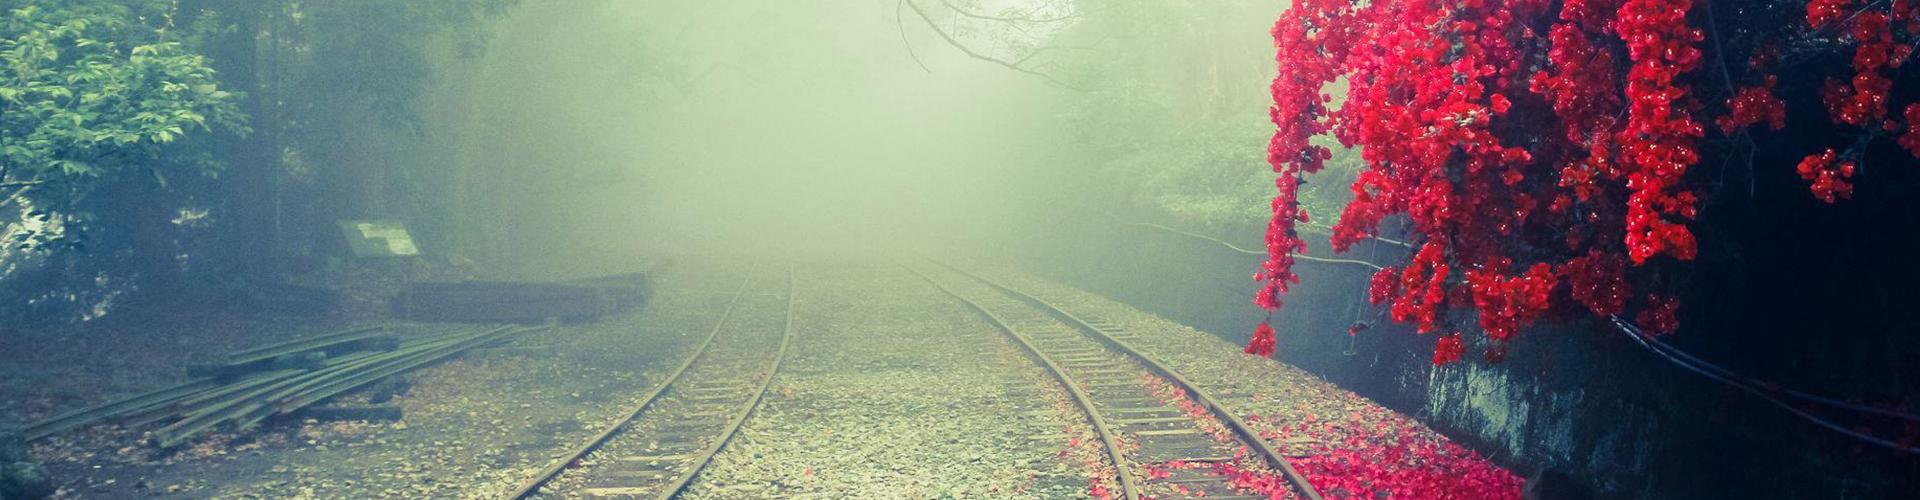 Sortez du brouillard